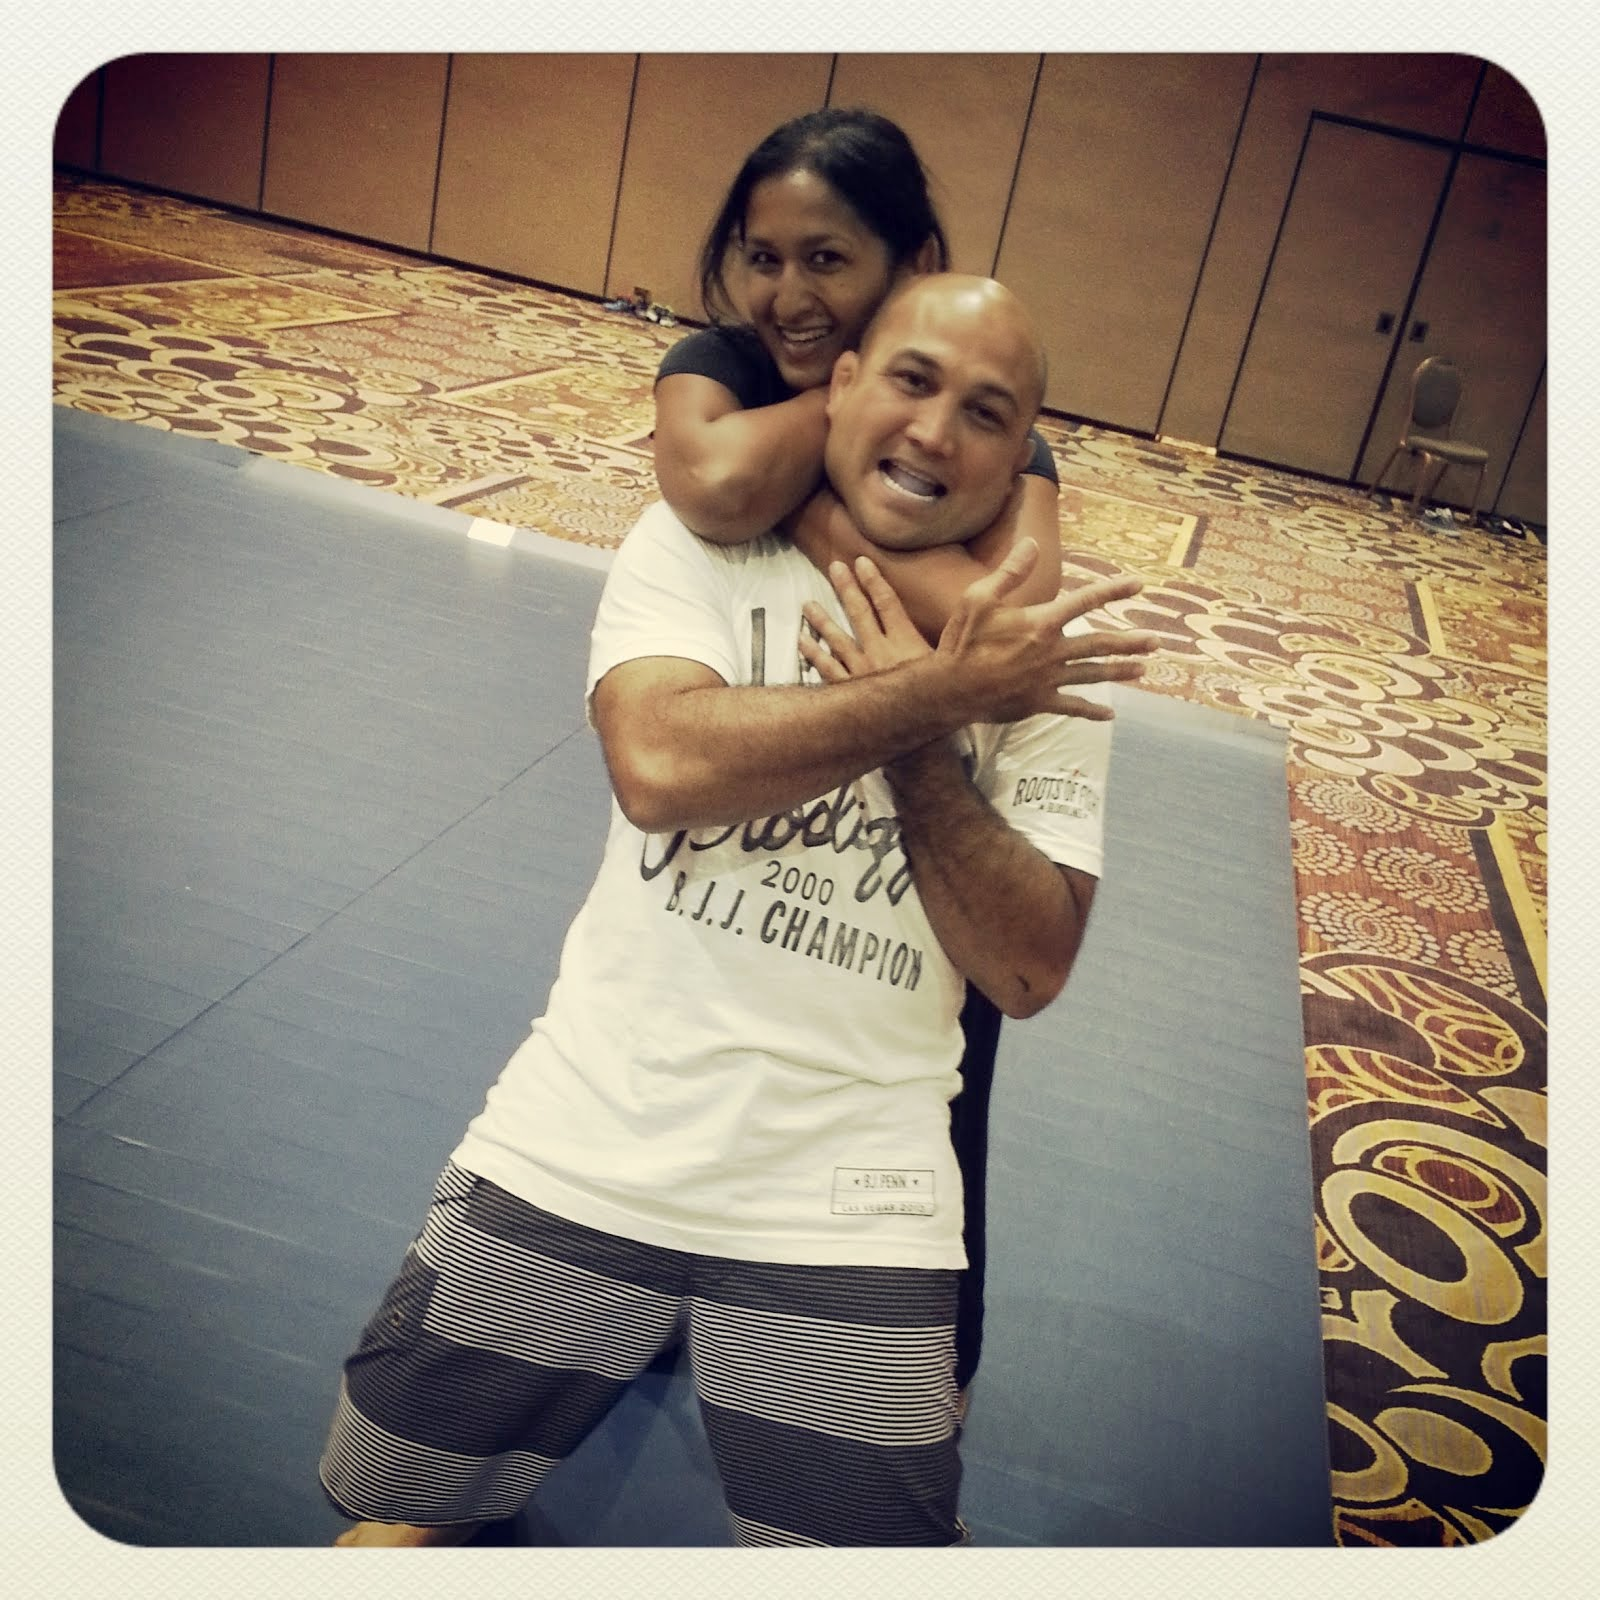 Las Vegas Training